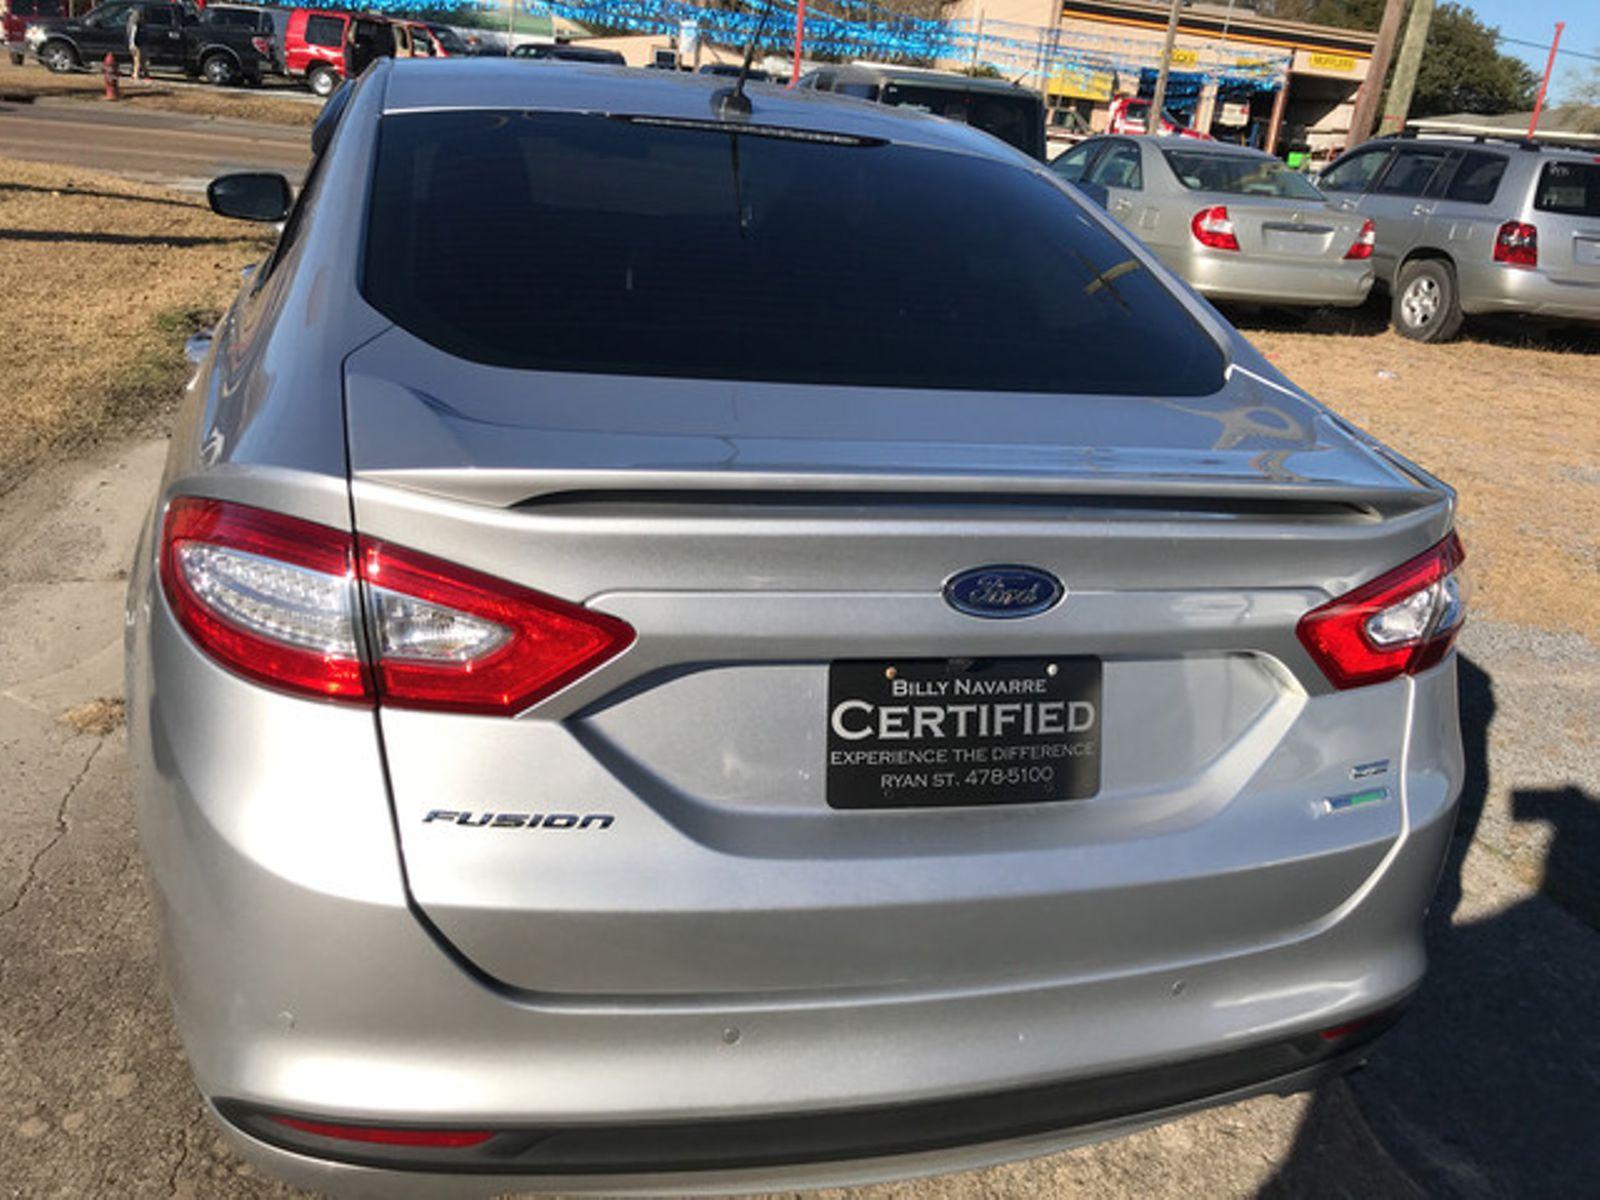 2016 Ford Fusion SE city Louisiana Billy Navarre Certified